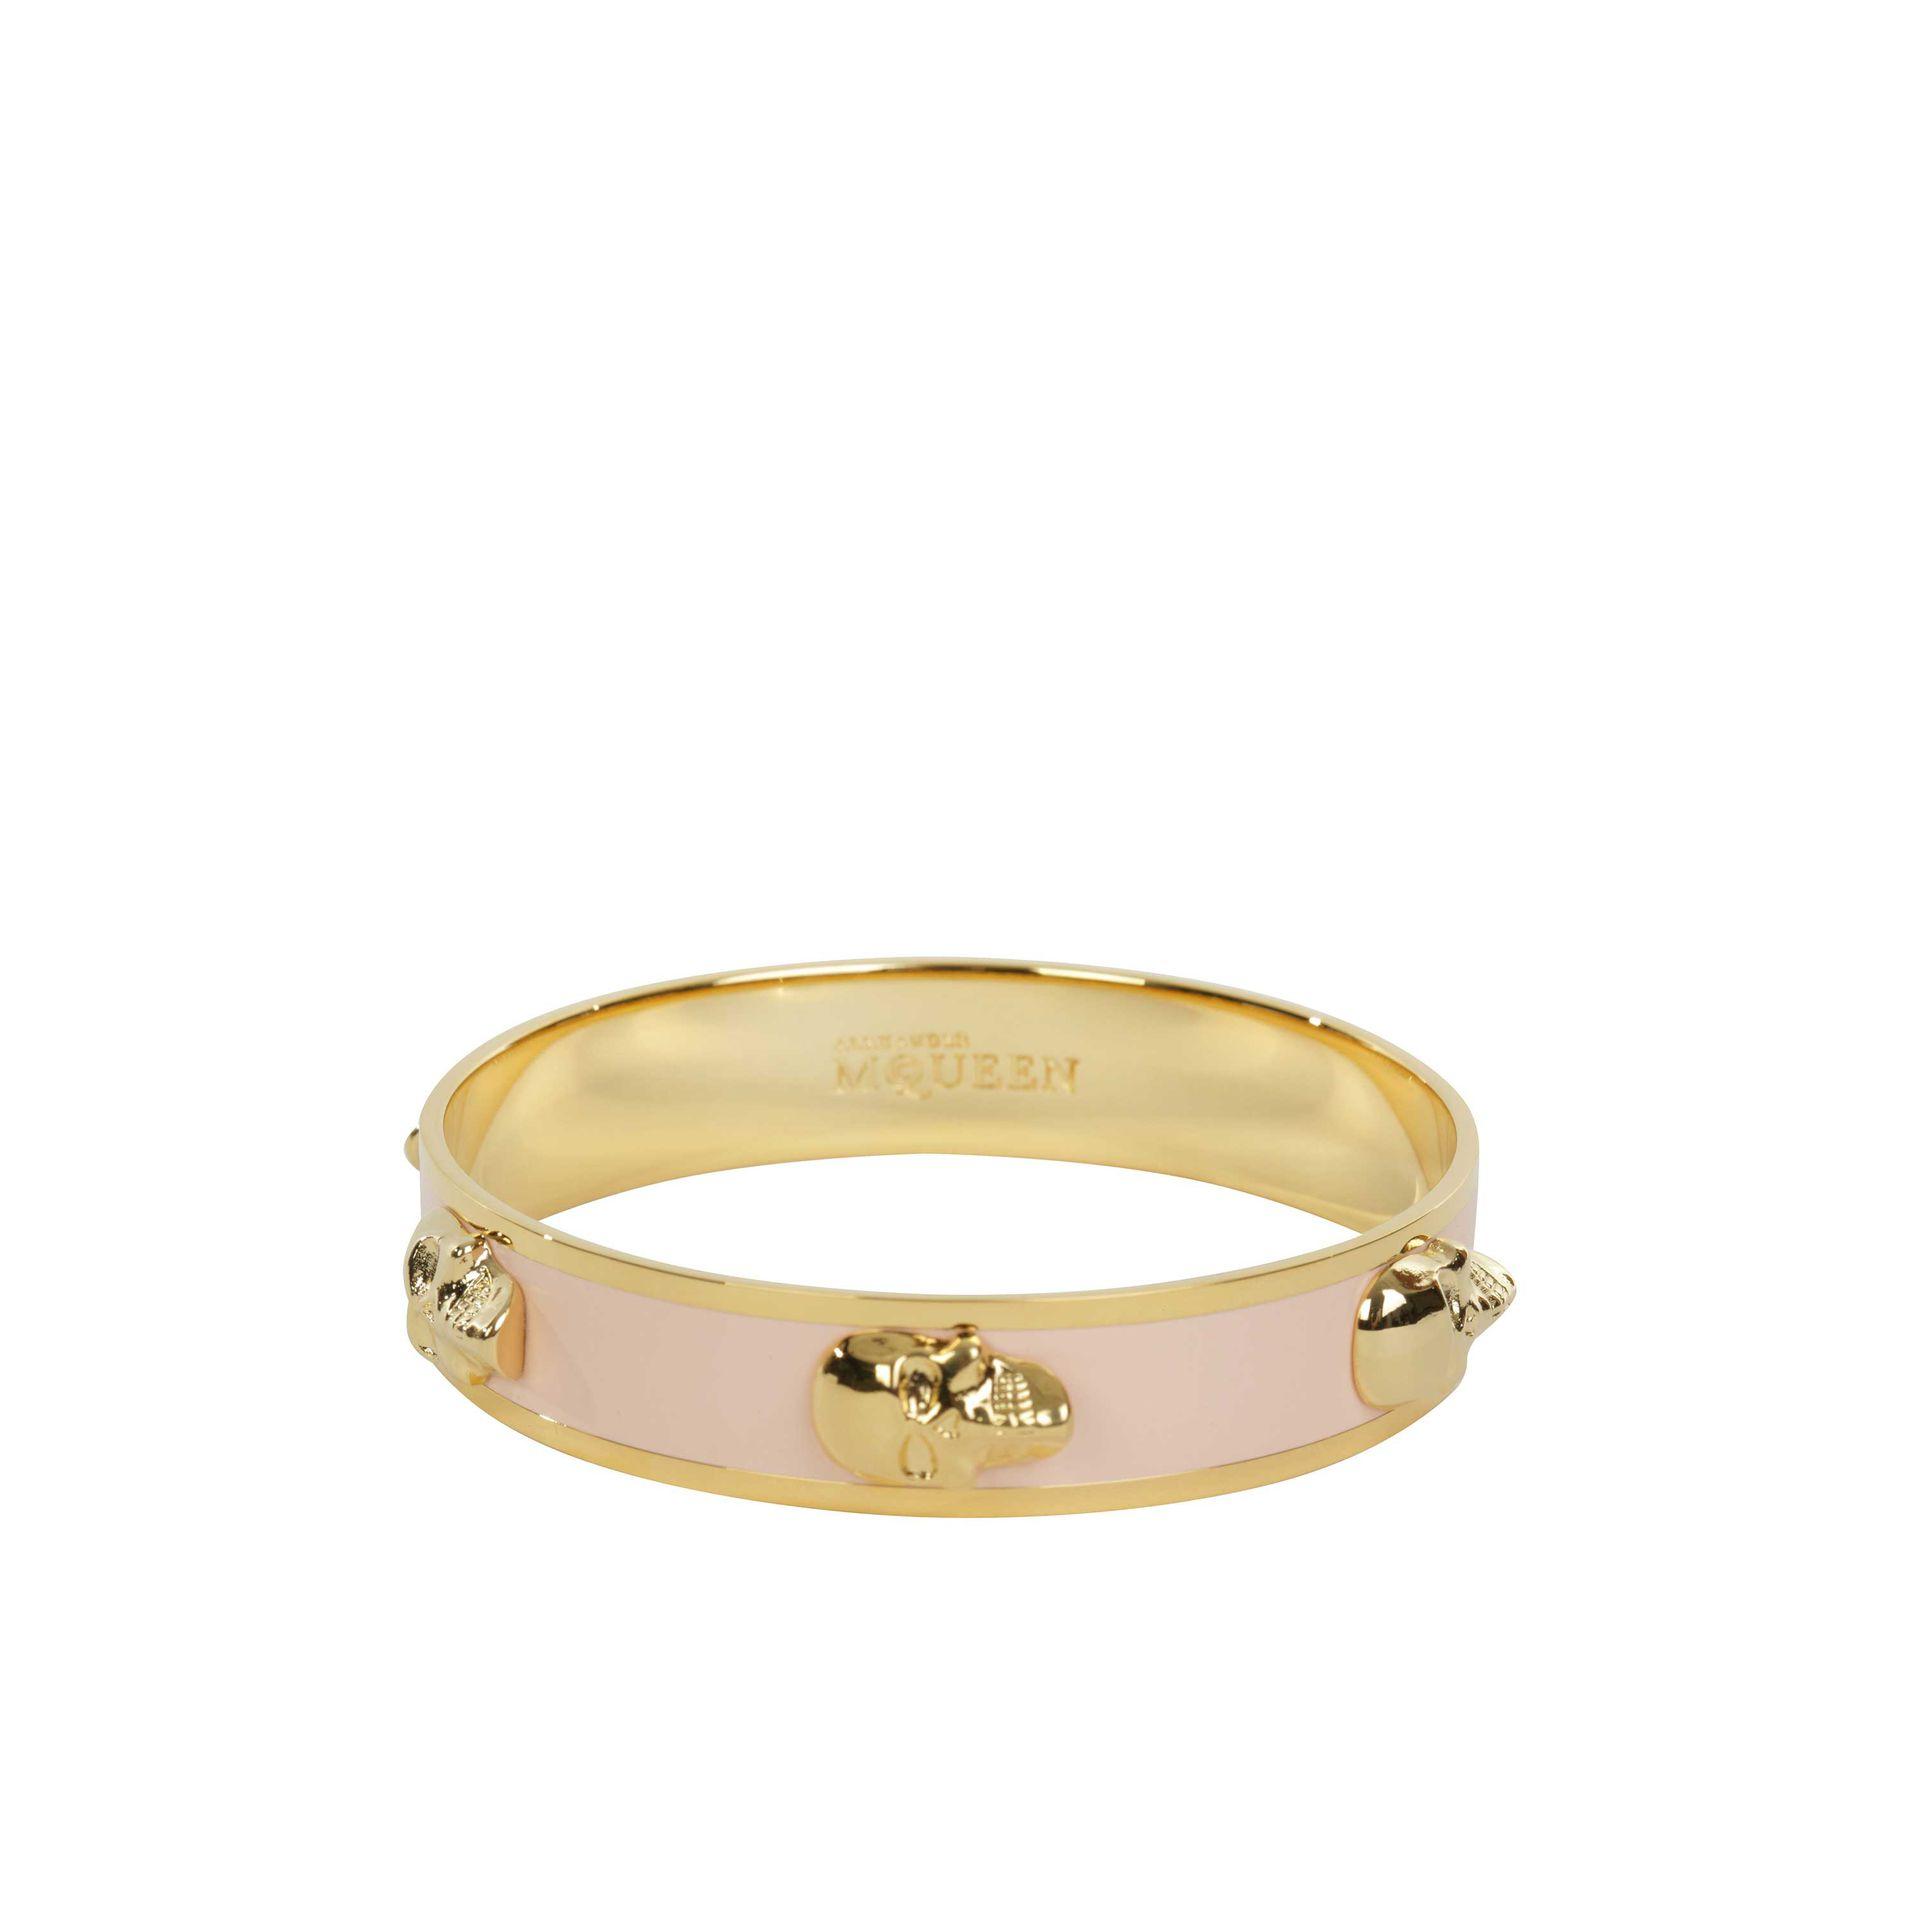 Alexander McQueen 3D Skull Enamel Bangle in Gold/Pink (Pink)